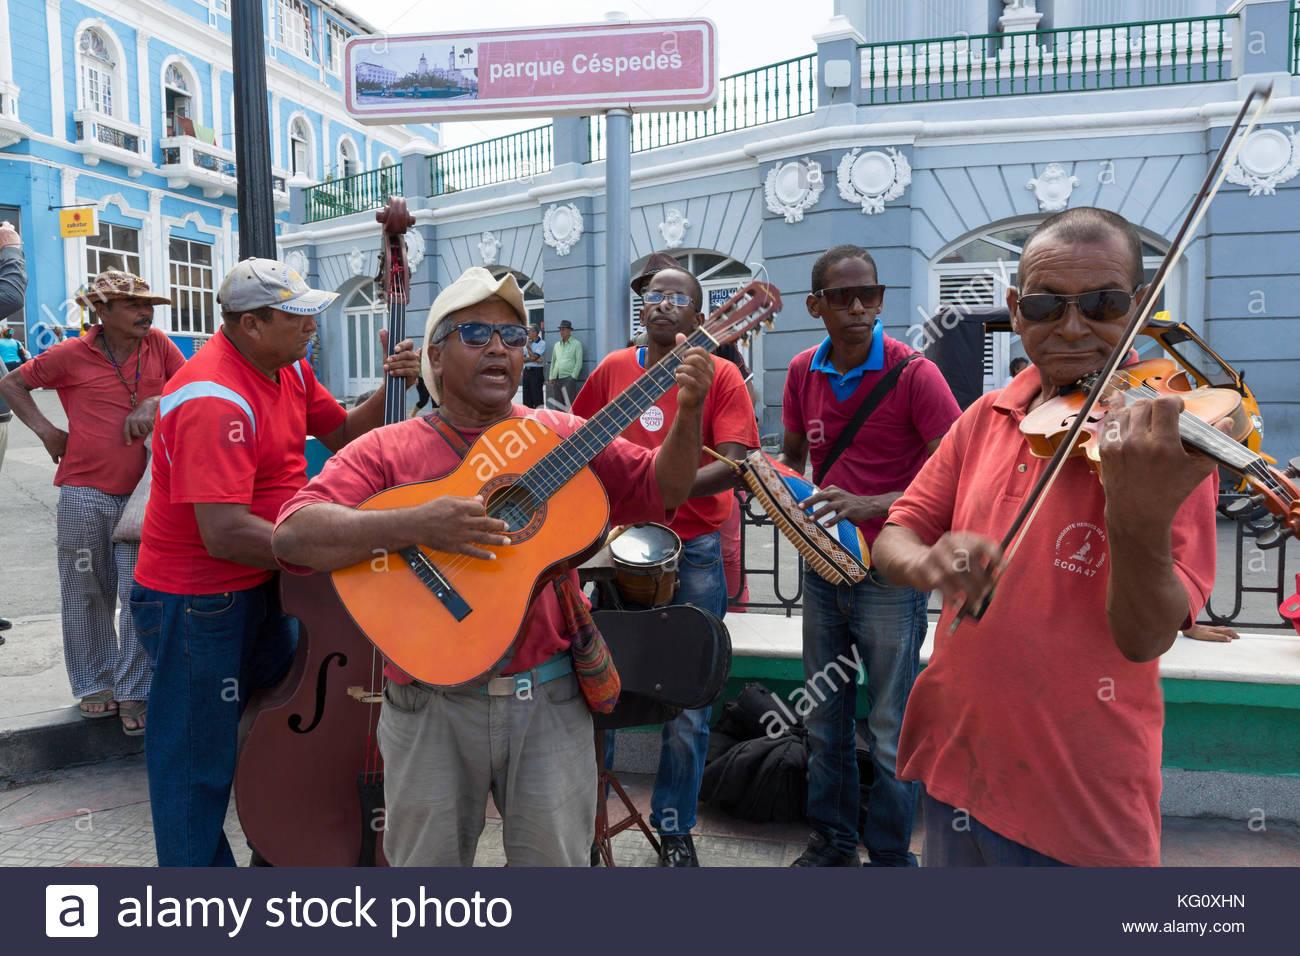 Musiker im Stadttzentrum, Santiago de Cuba, Kuba Engl.: Kuba, Santiago de Cuba, Musiker, kubanische Musik Stockbild